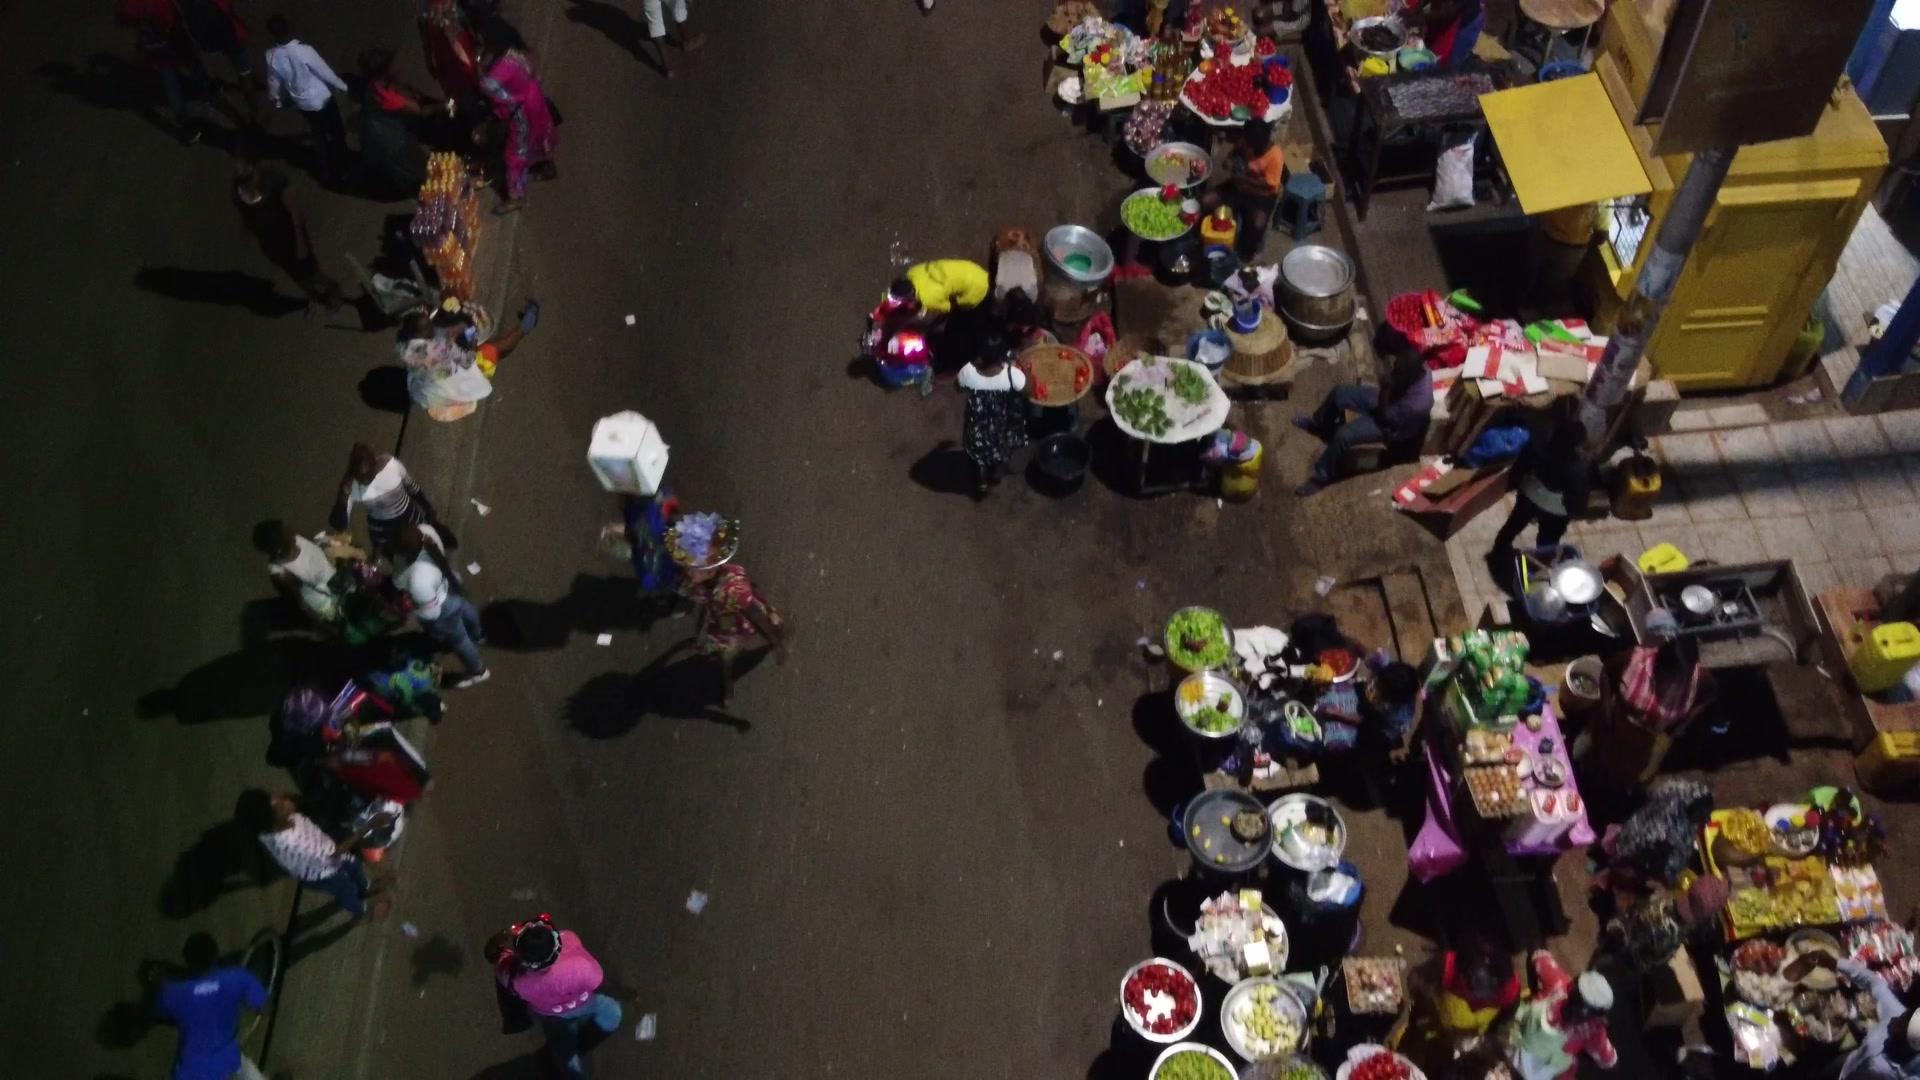 Koforidua Night Market Sellers Traders Crowd Busy Cars Traffic